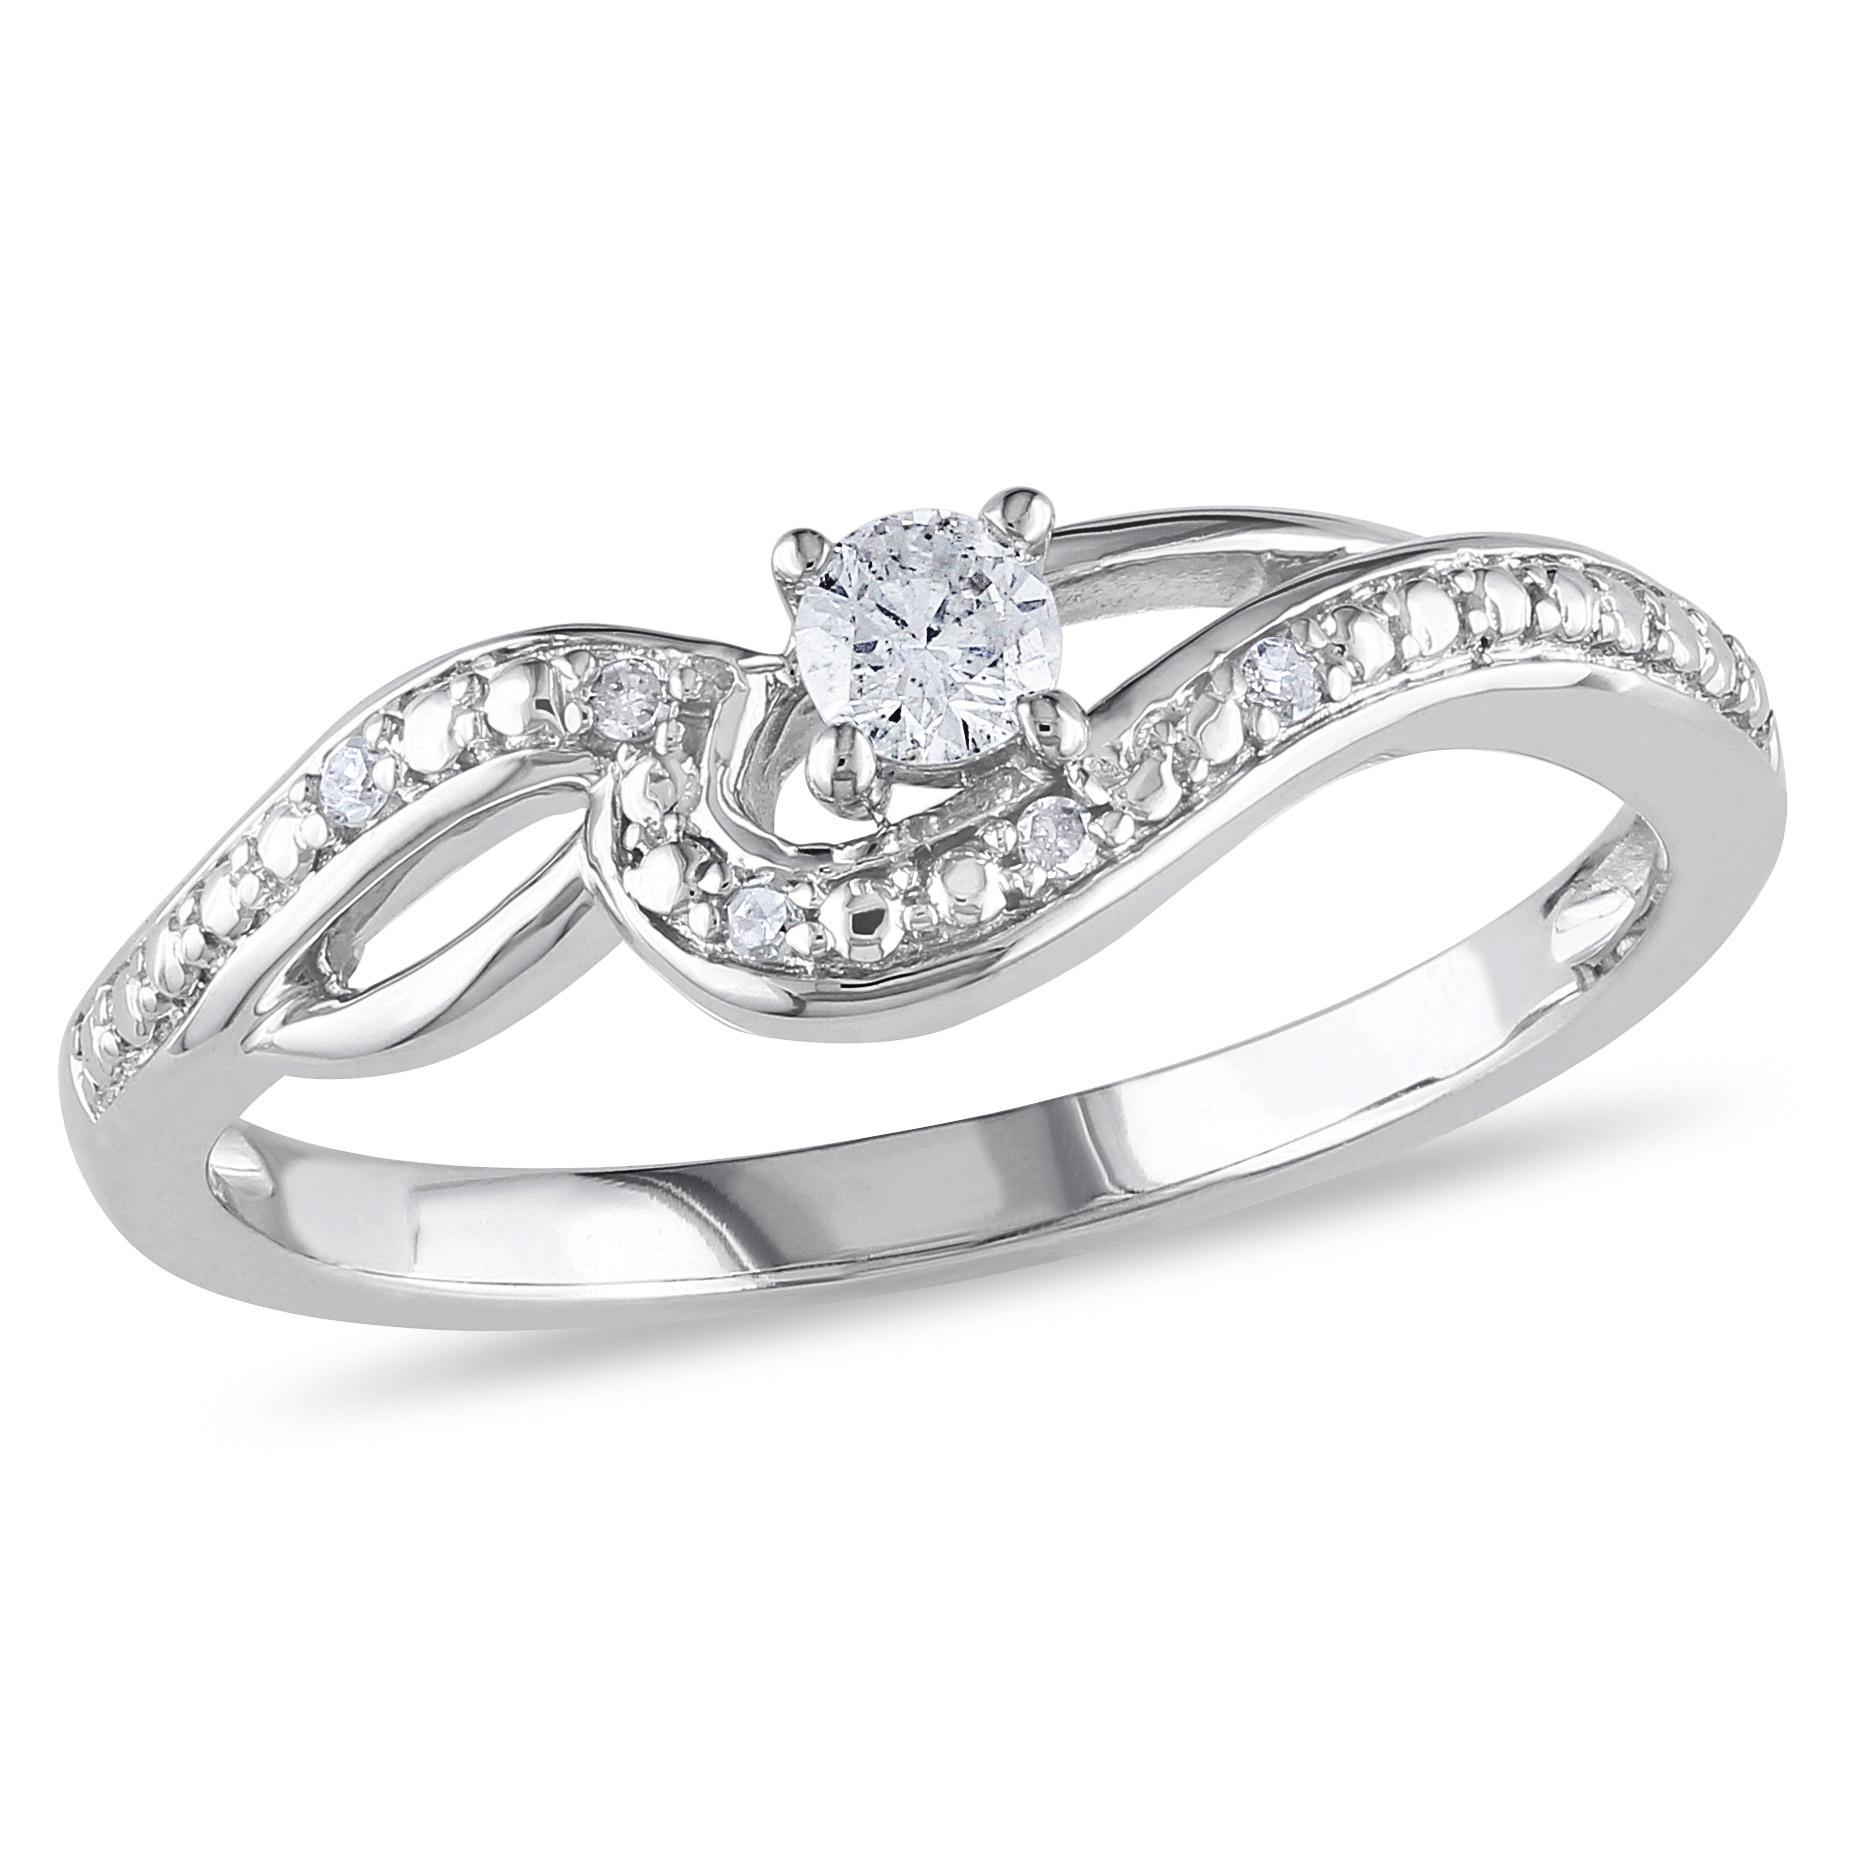 10k White Gold 0.15 CTTW Diamond Infinity Ring